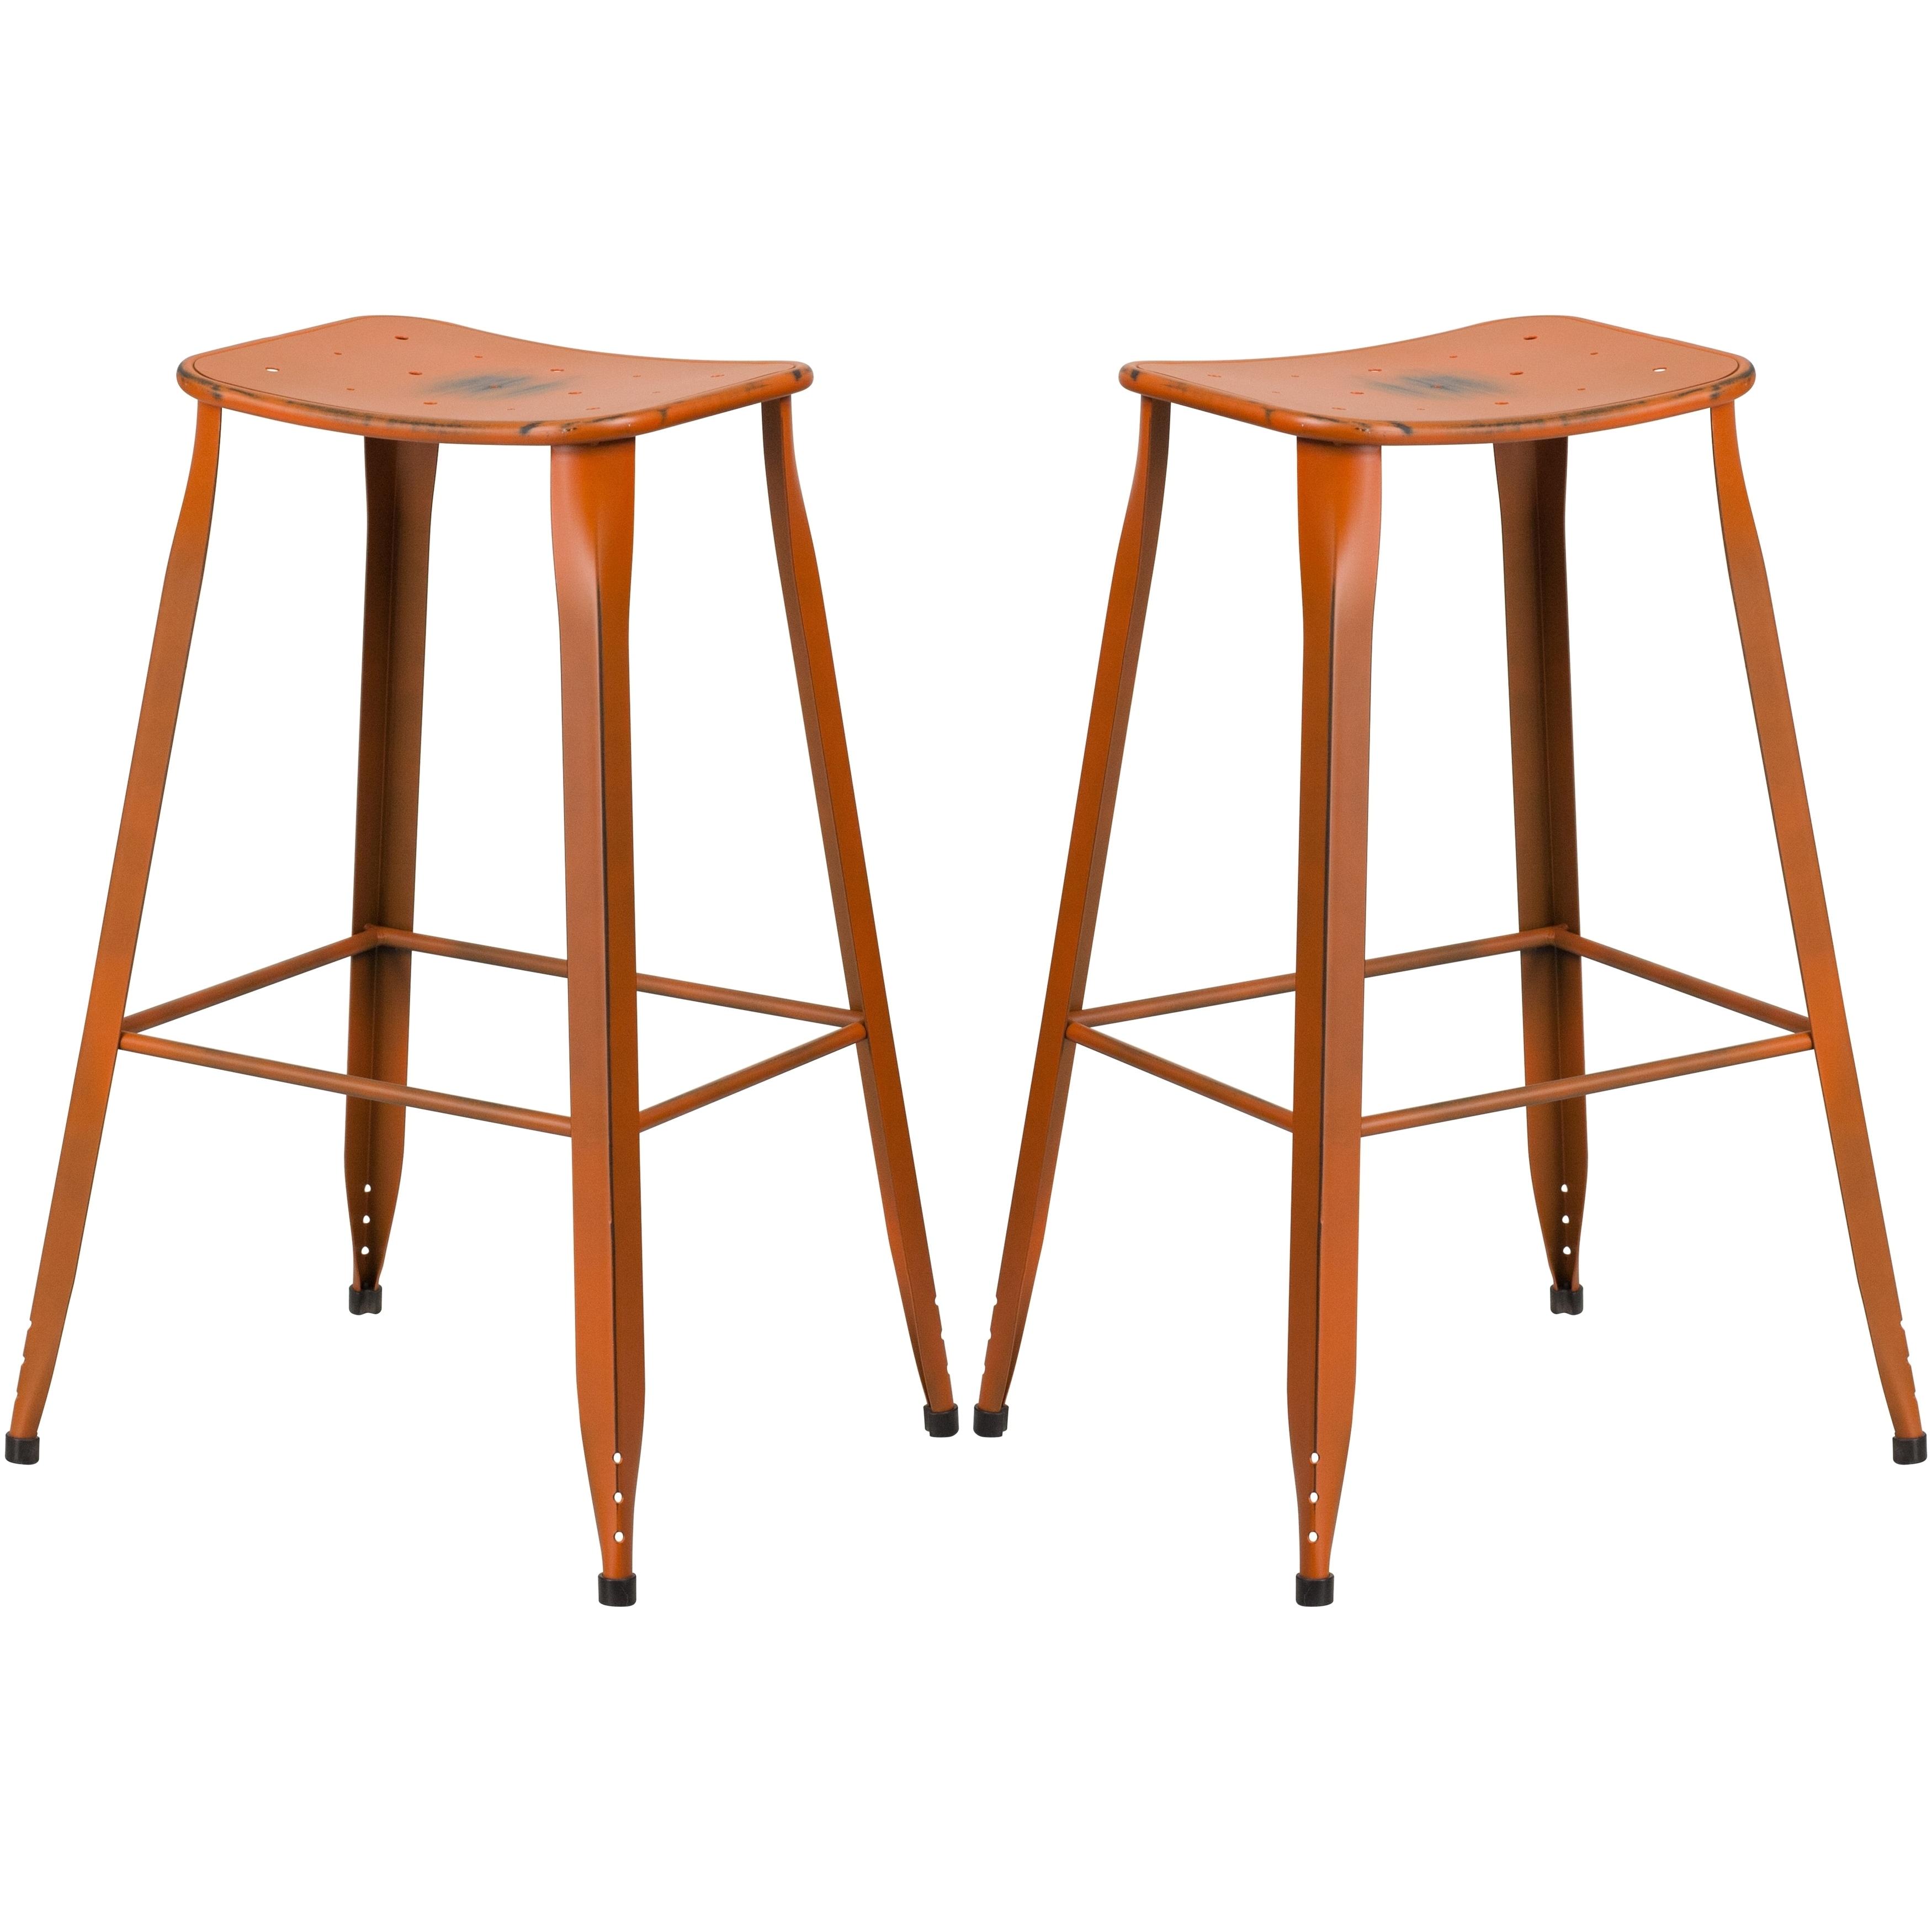 Awe Inspiring Distressed Orange Galvanized Metal 30 Inch Bar Stool Creativecarmelina Interior Chair Design Creativecarmelinacom